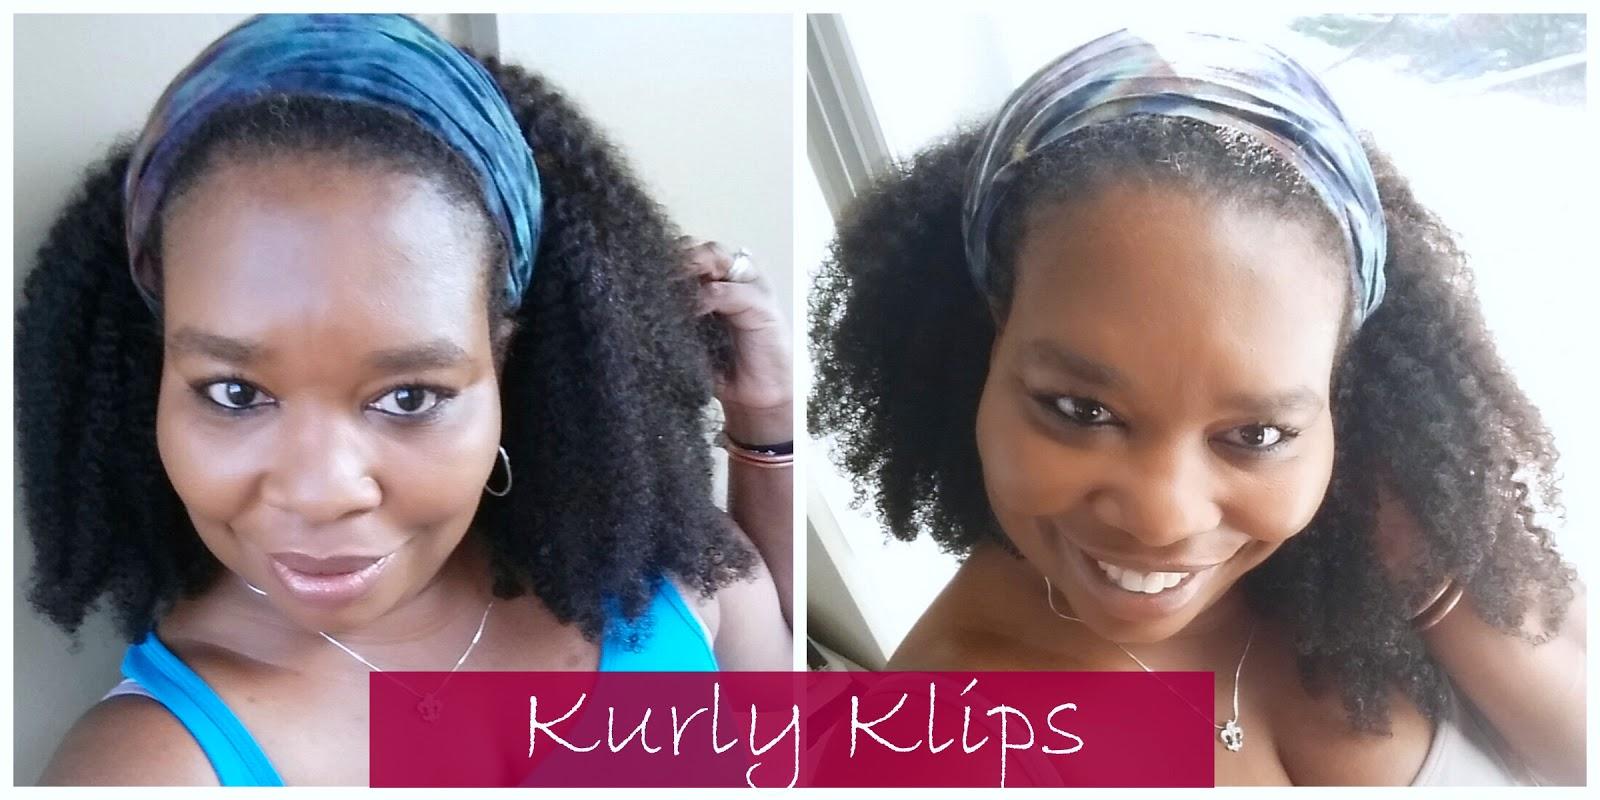 Kurly Klips: Fun, Flirty and Great For Fall